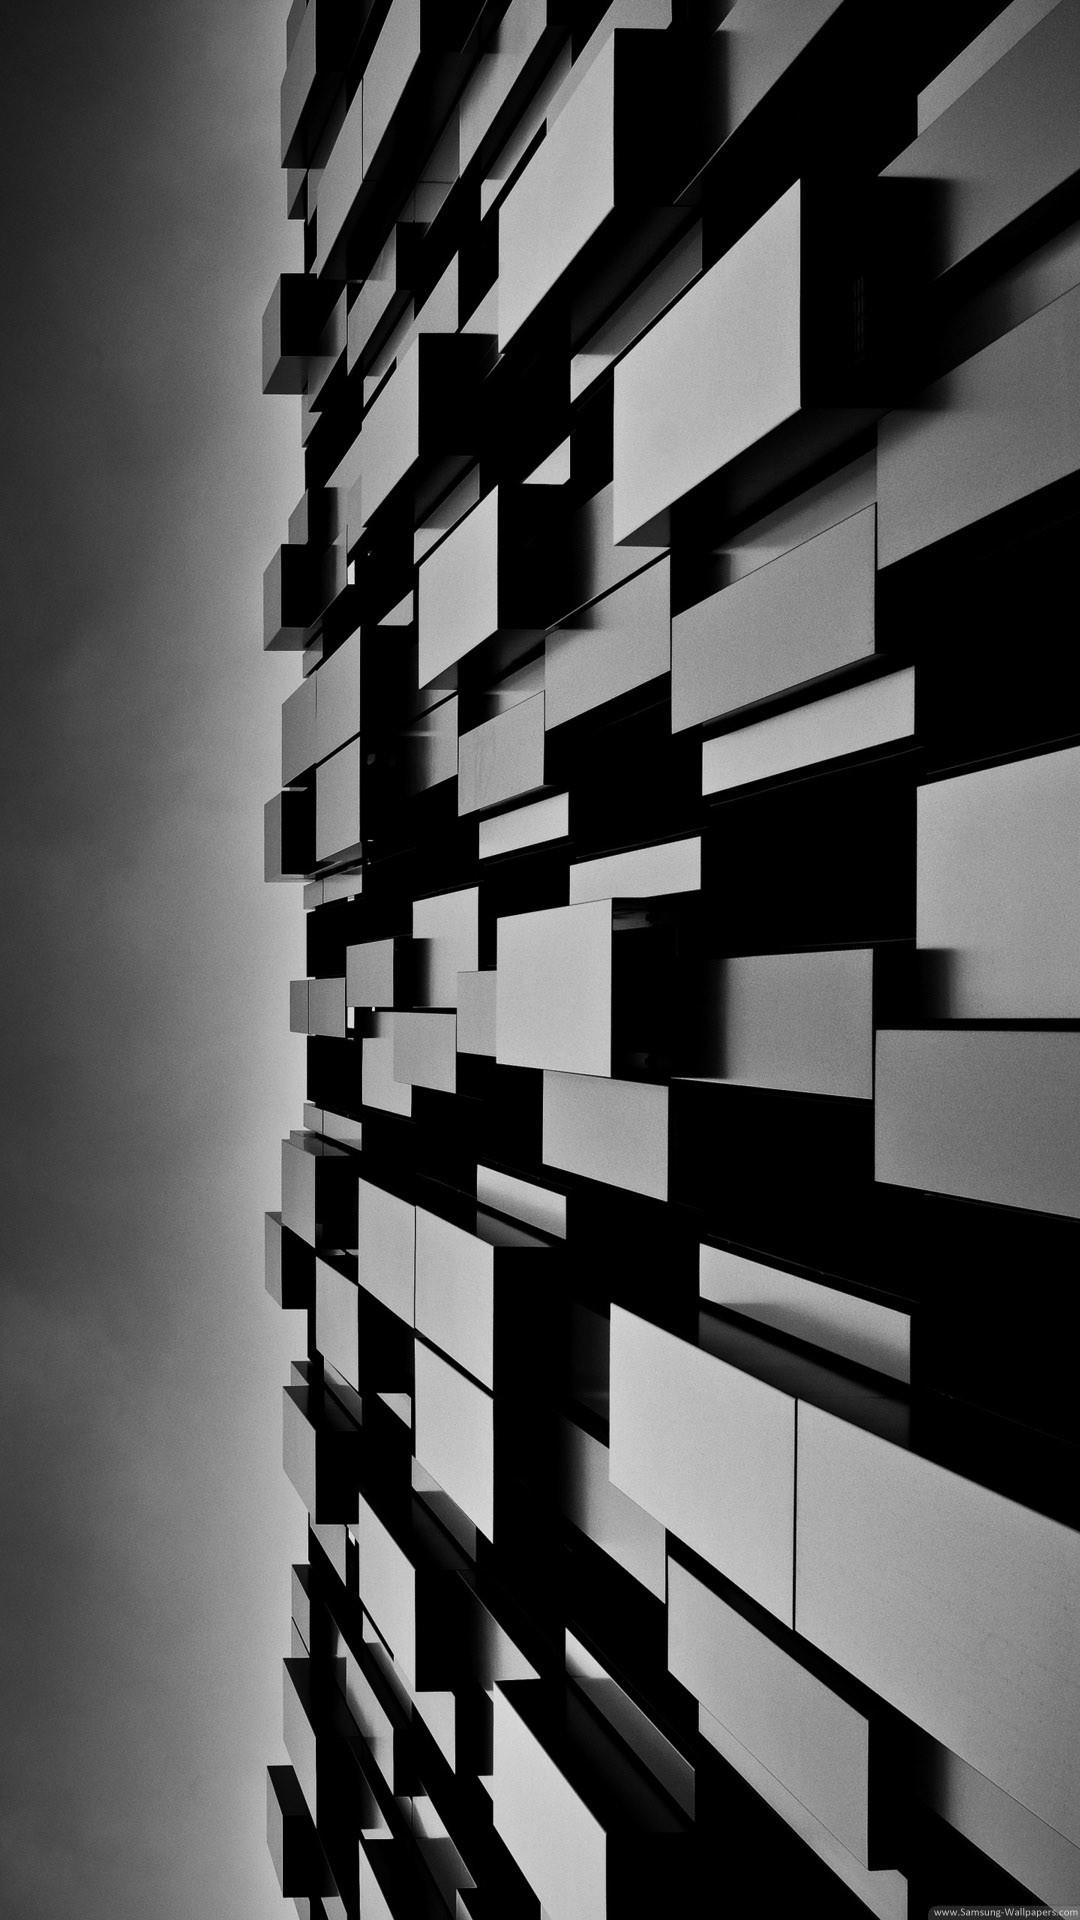 Black Wallpaper Abstract – wallpaper.